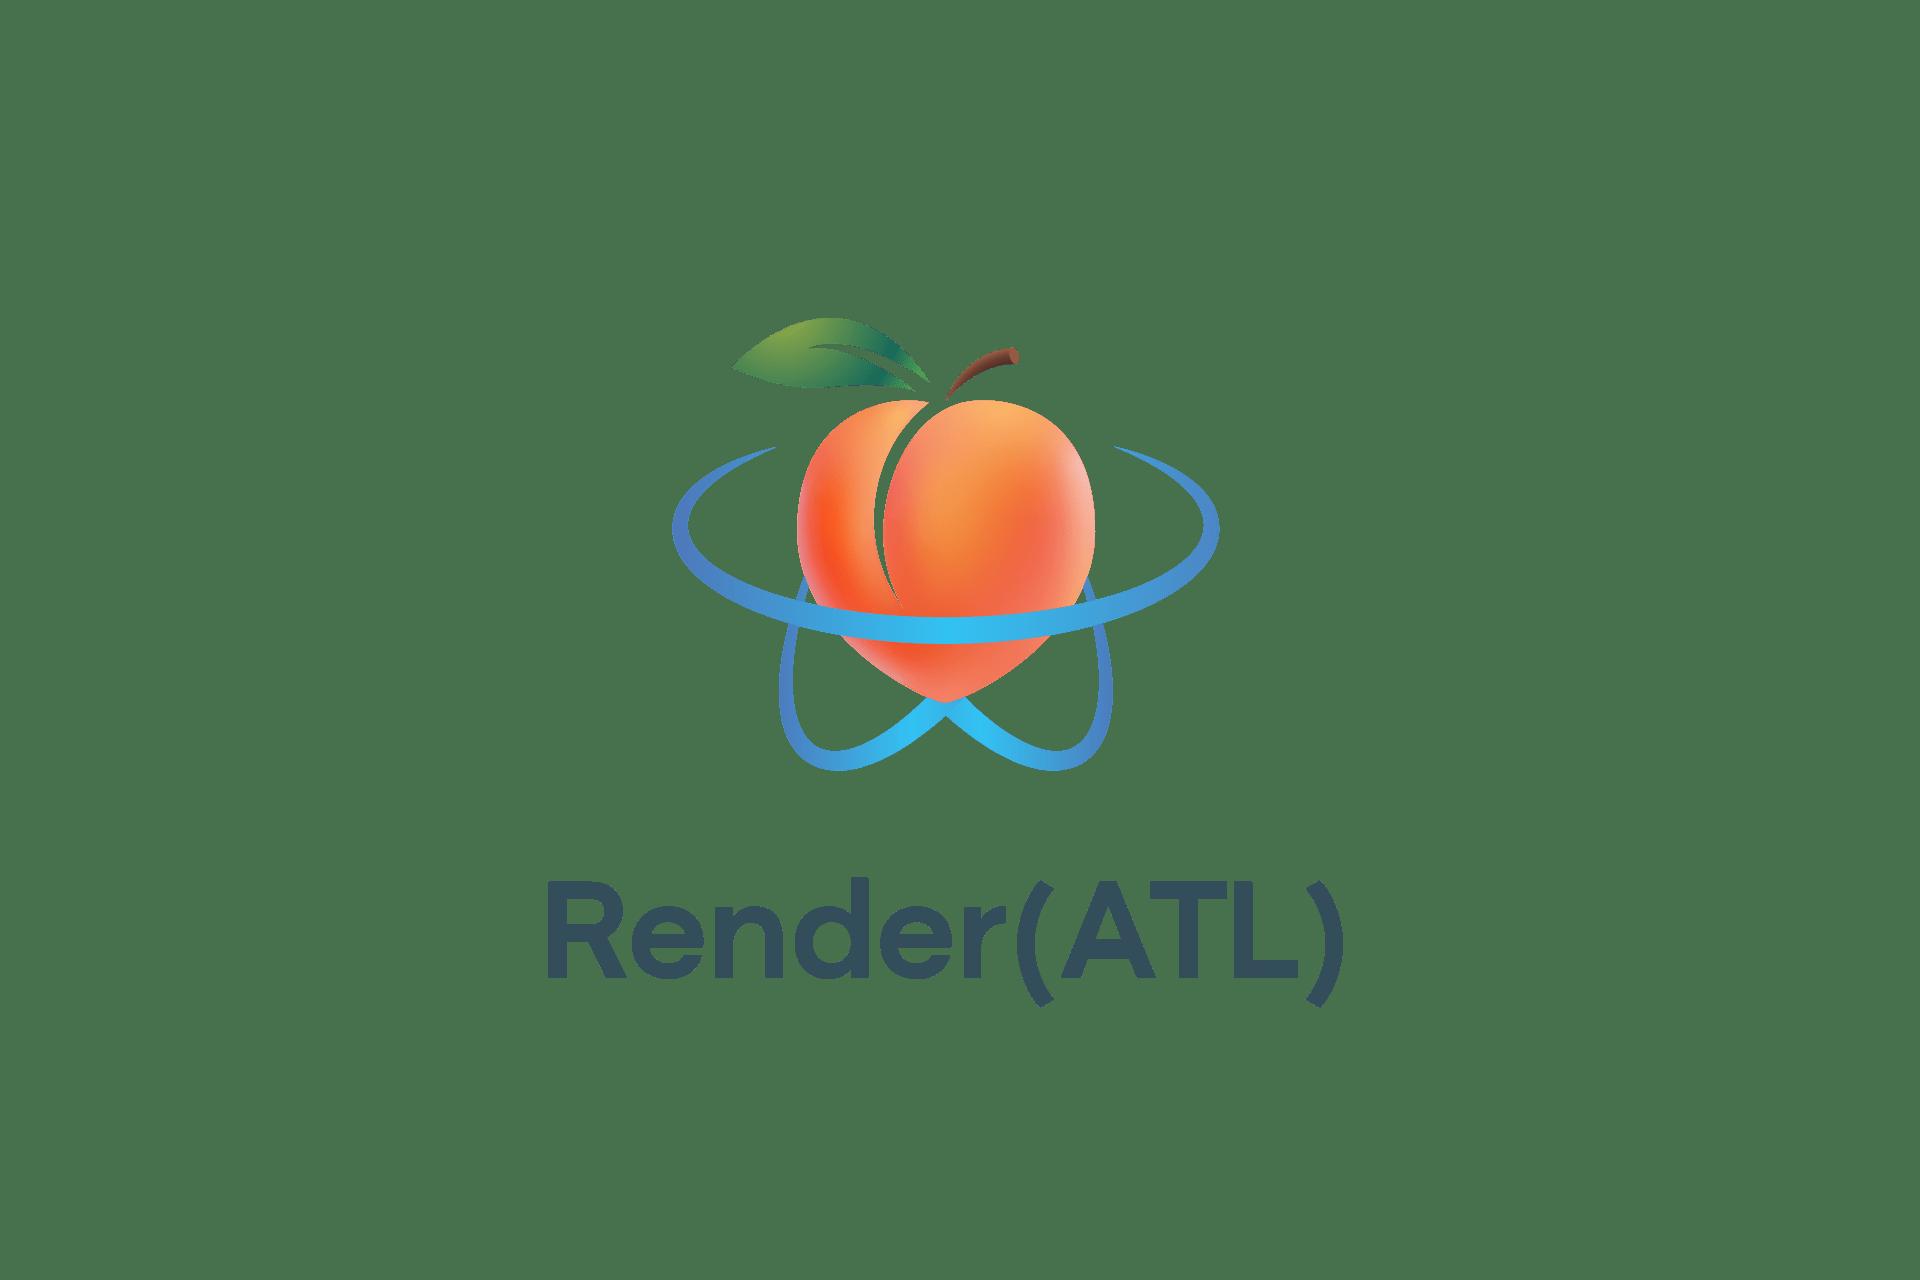 Render-Atlanta logo